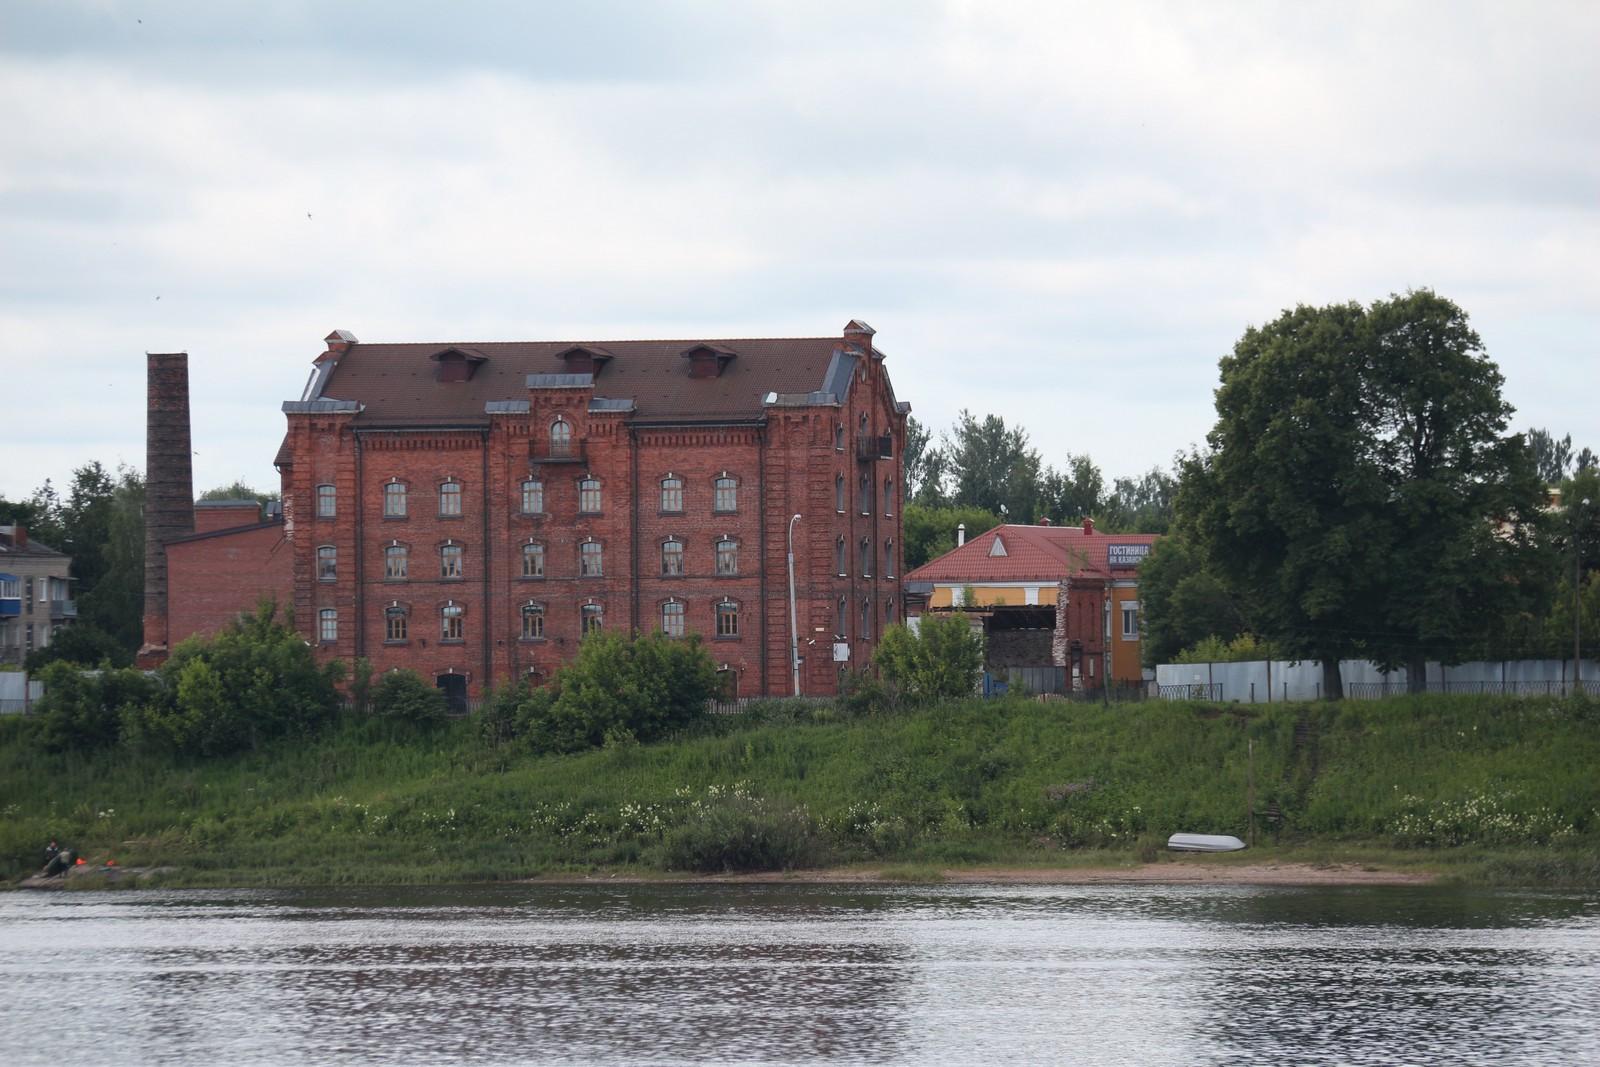 Мельница купца Калашникова (Рыбинск)